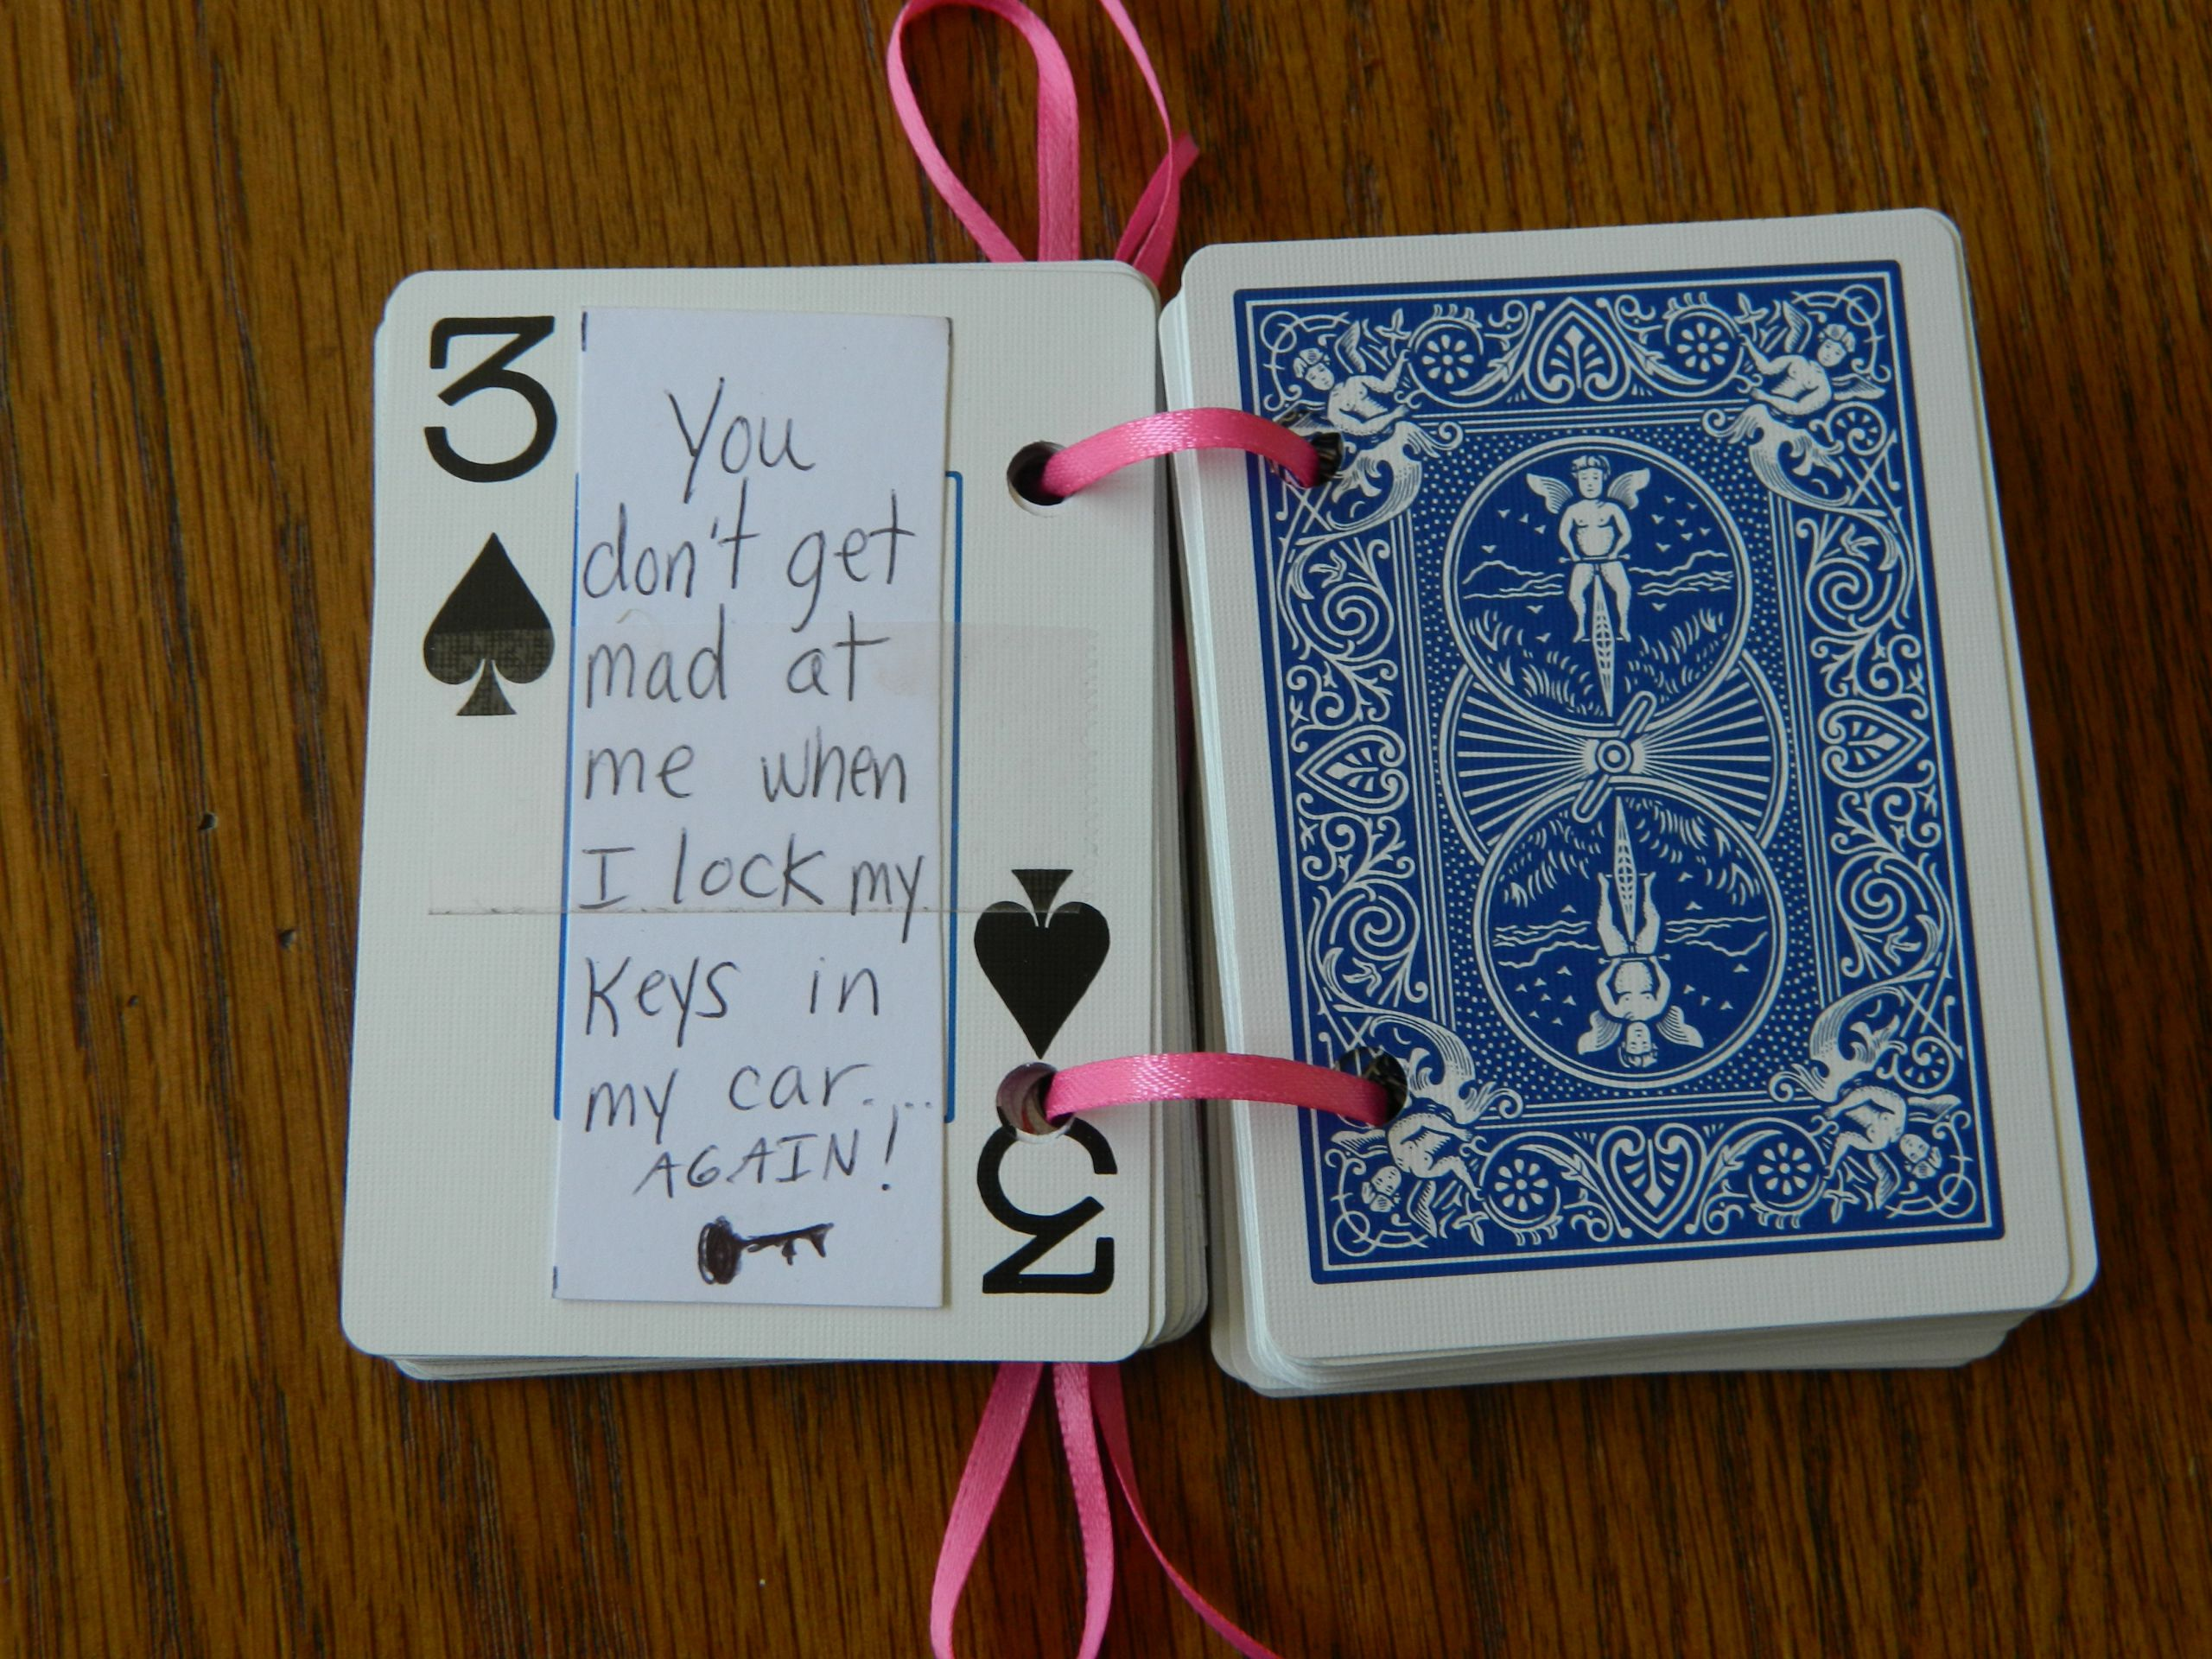 Sentimental Gift Ideas For Boyfriend  1st Anniversary Gifts & A Sentimental D I Y